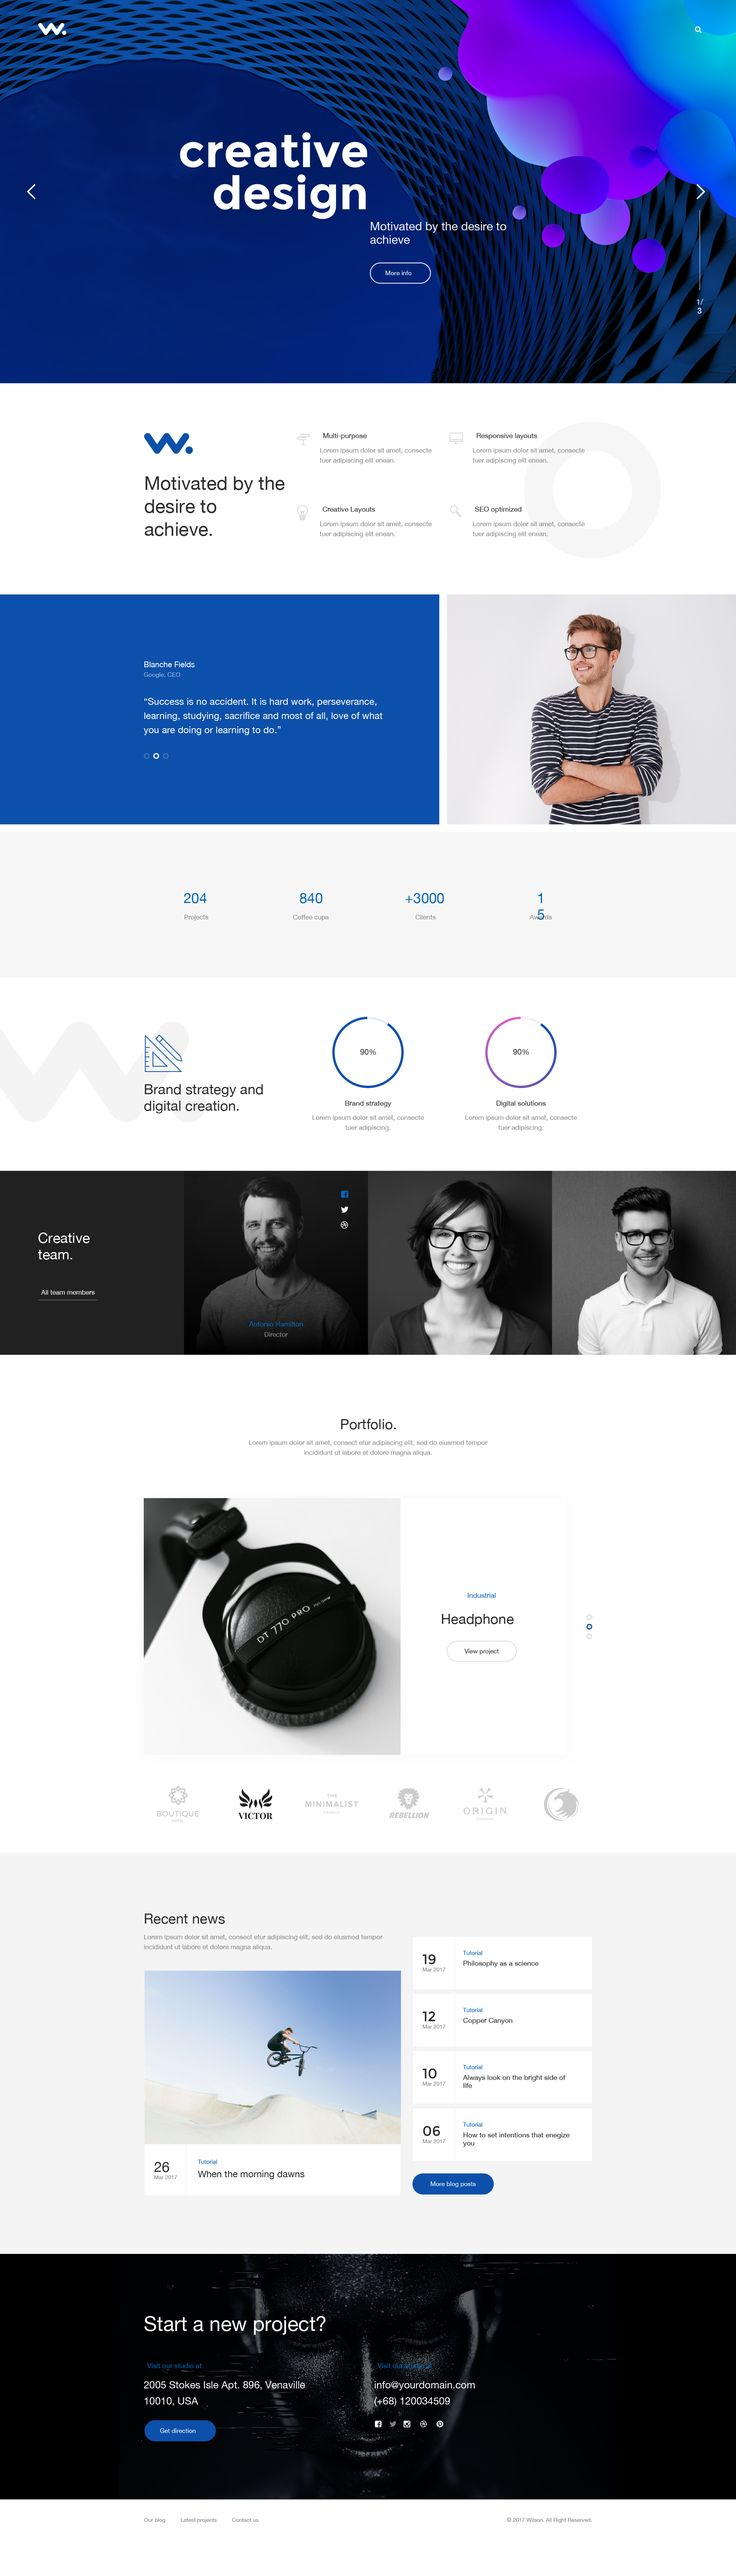 Dribbble - 2.jpg by Insight Studio